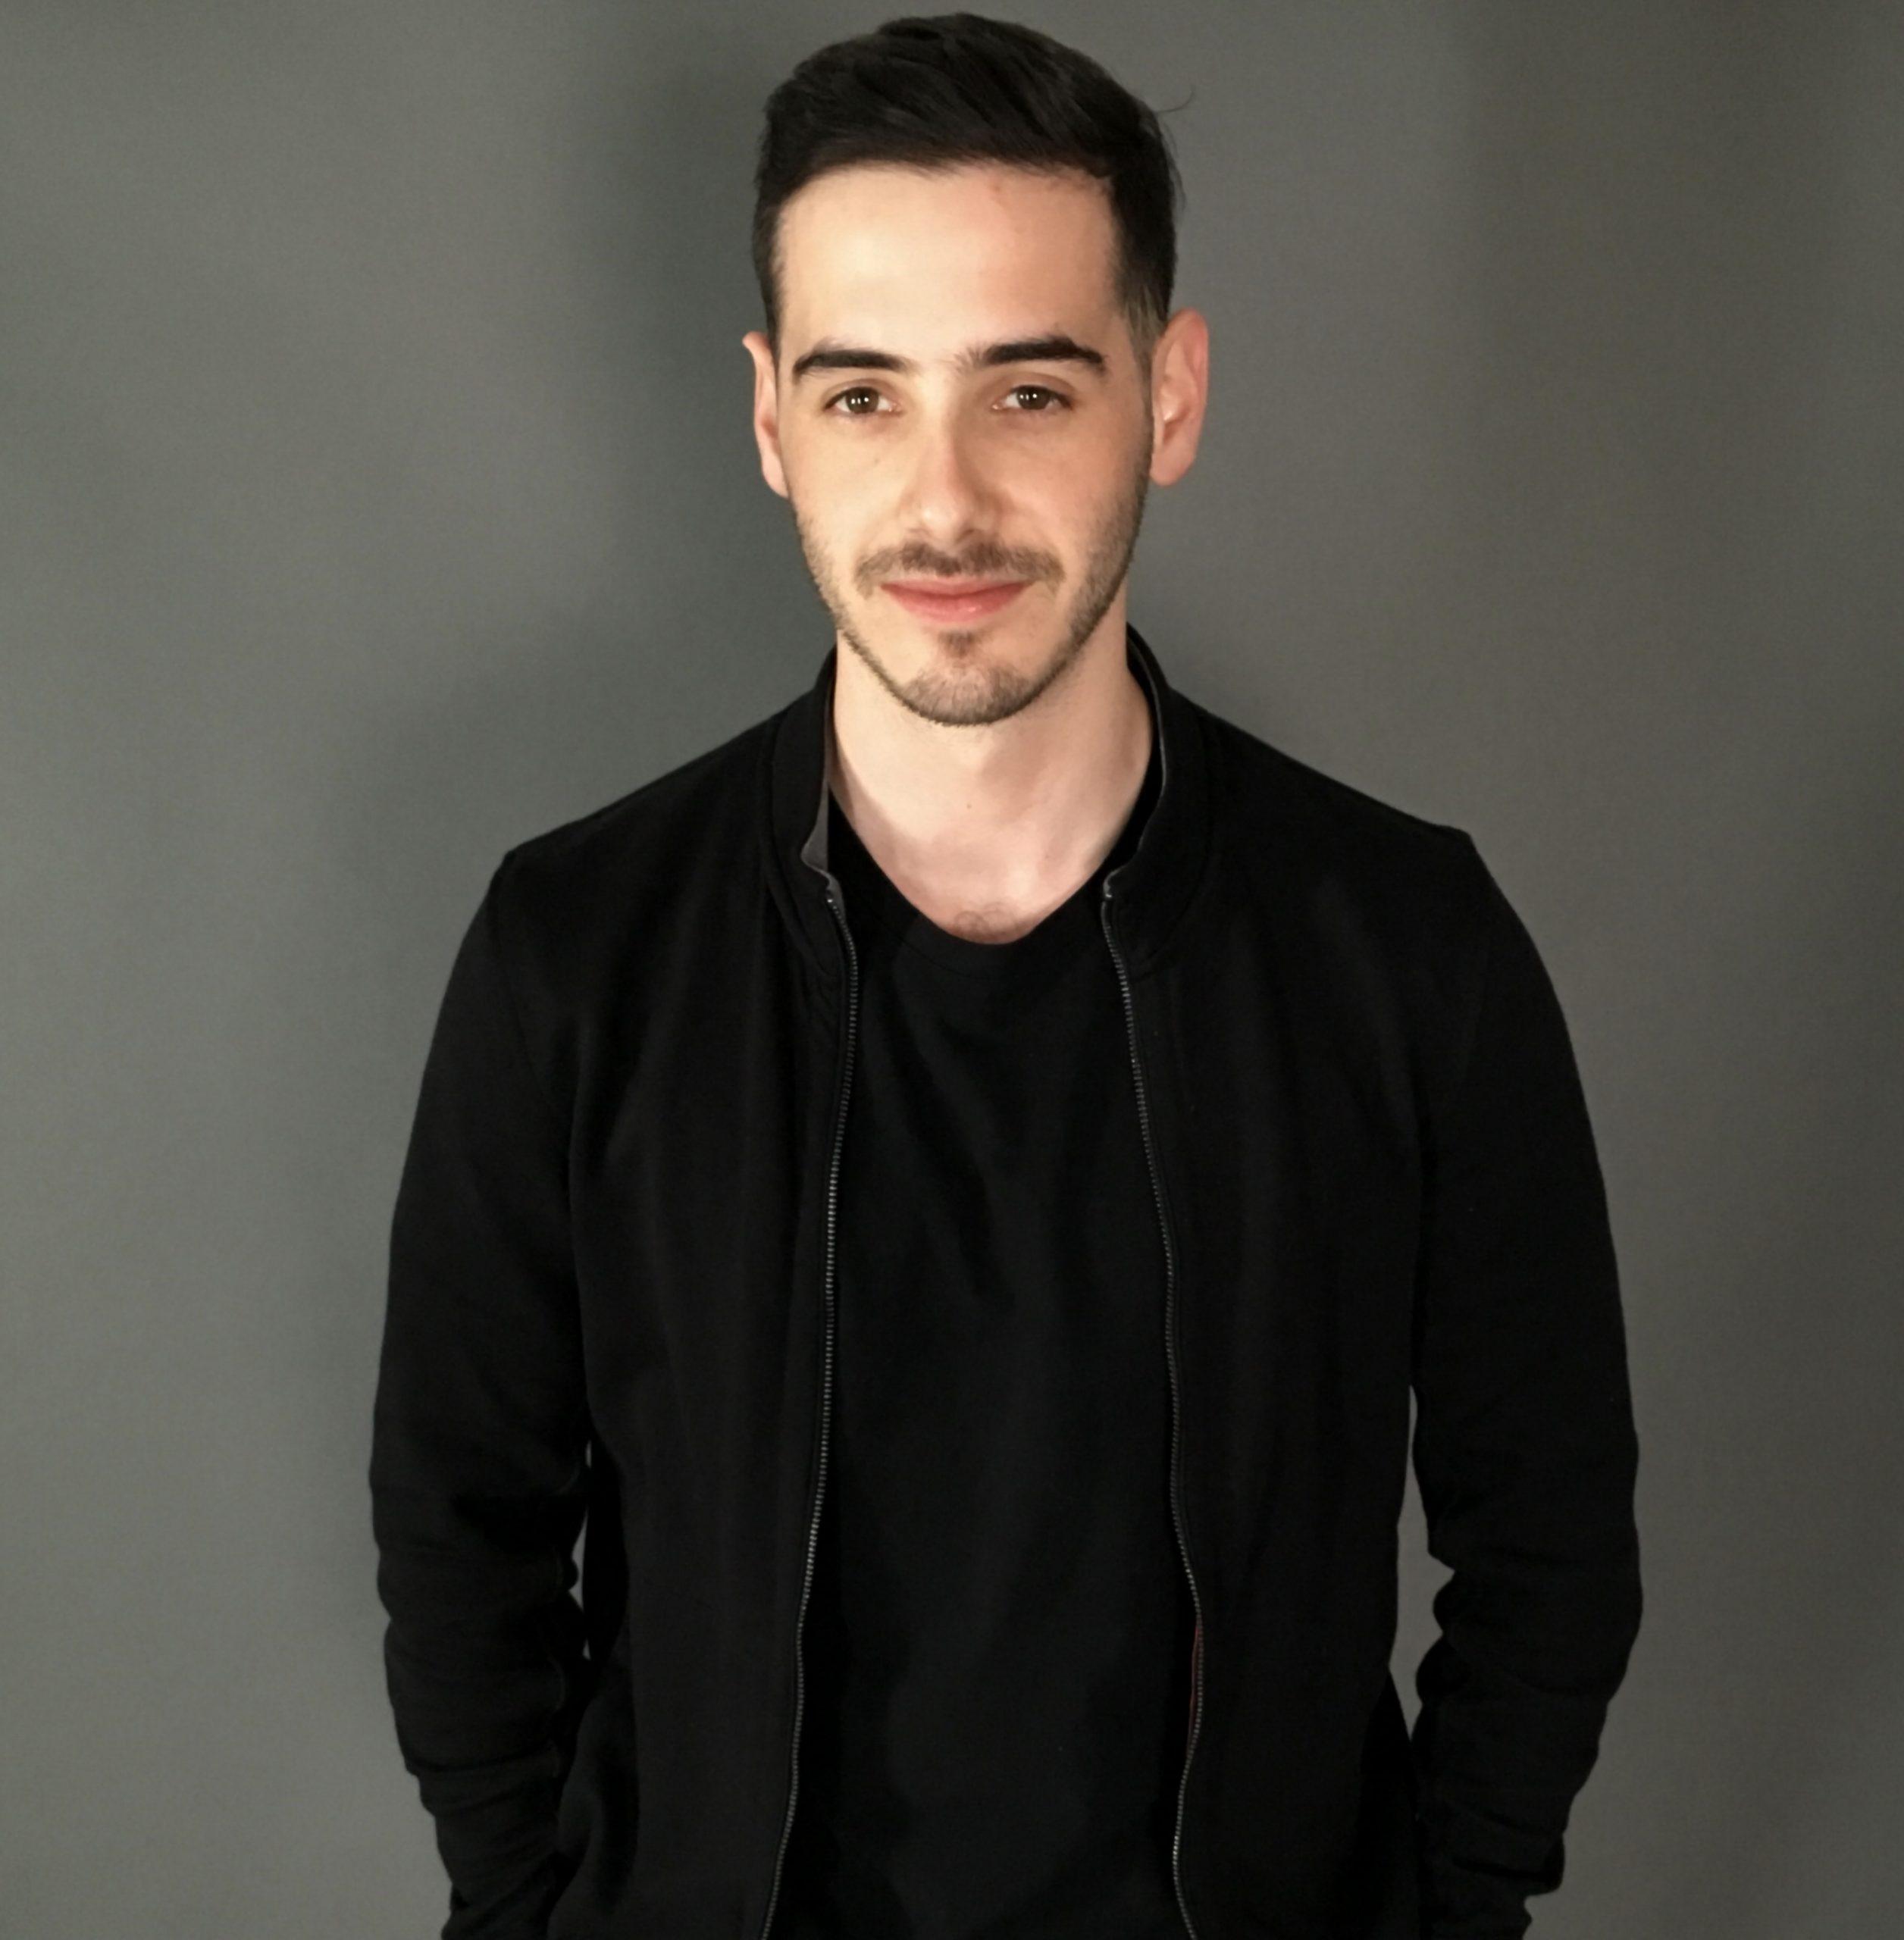 Andres Lozano